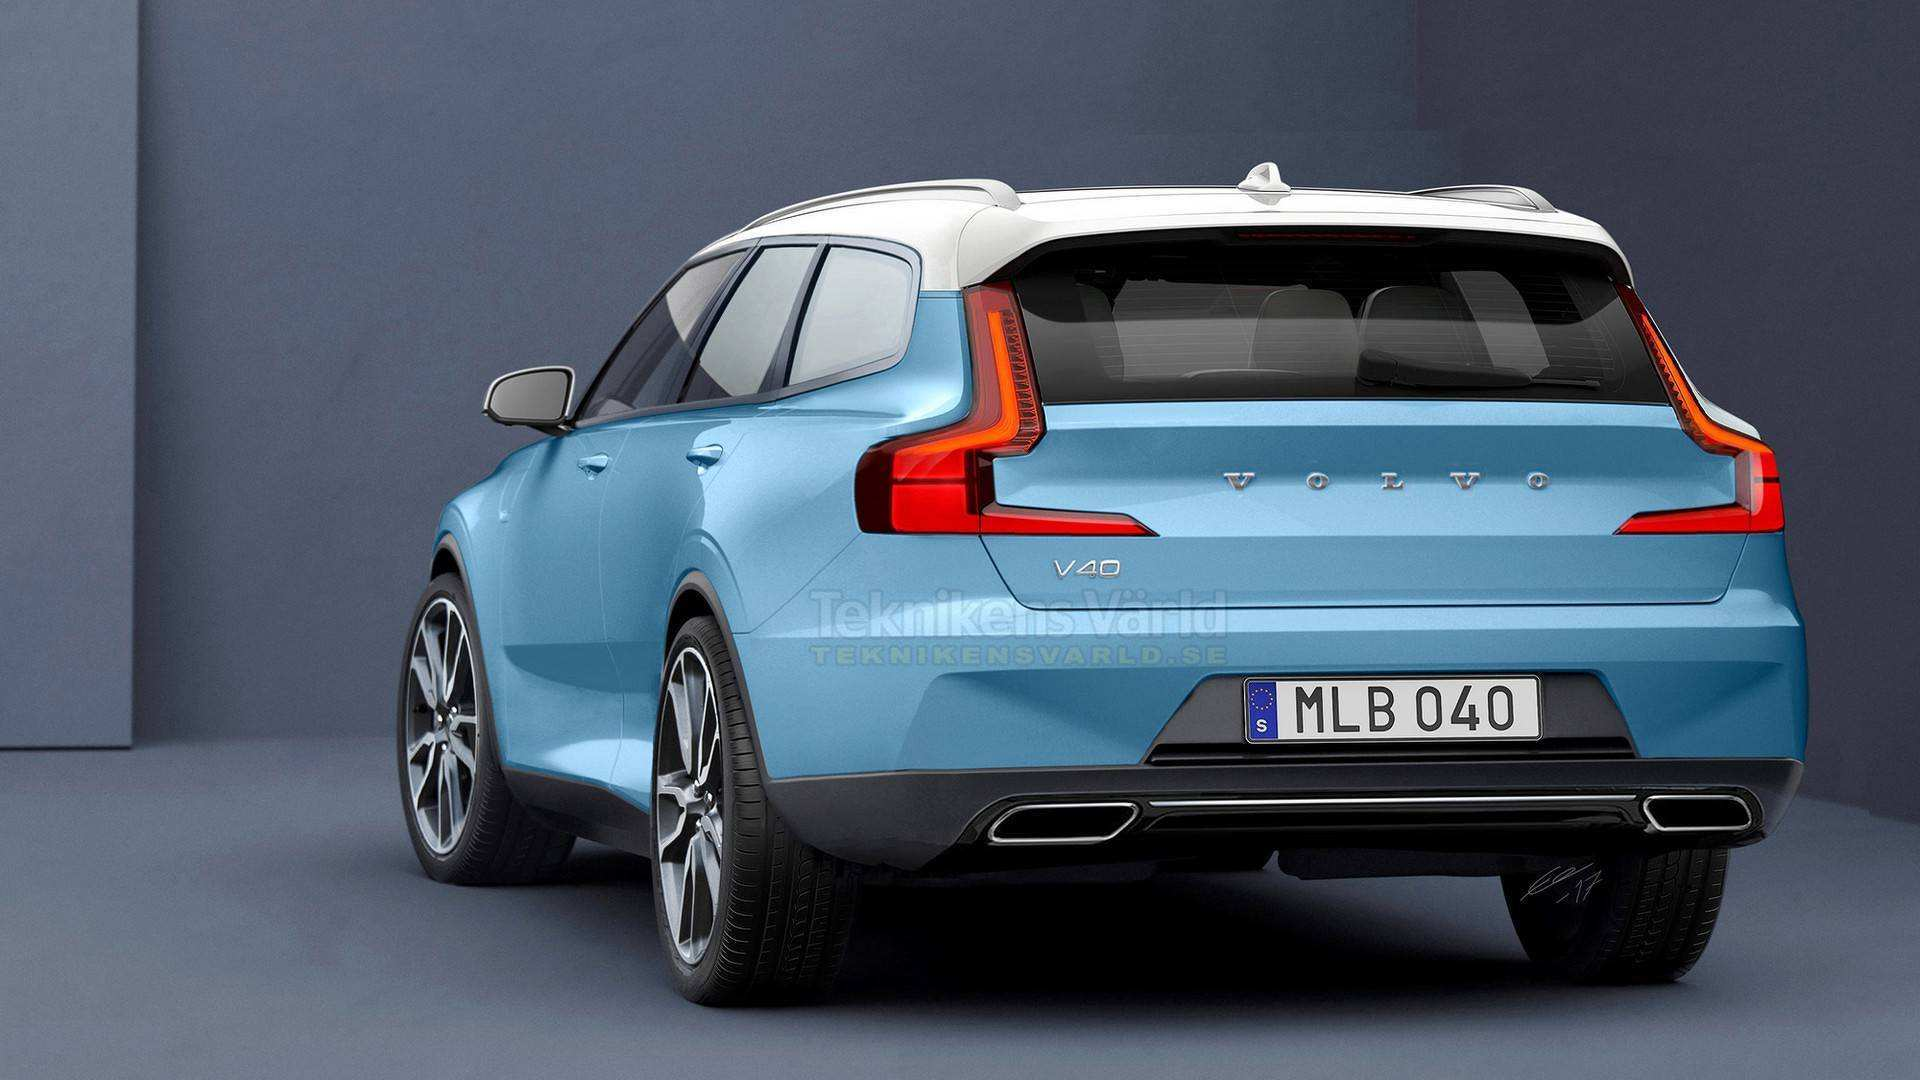 38 Concept of Volvo 2020 V40 Photos for Volvo 2020 V40